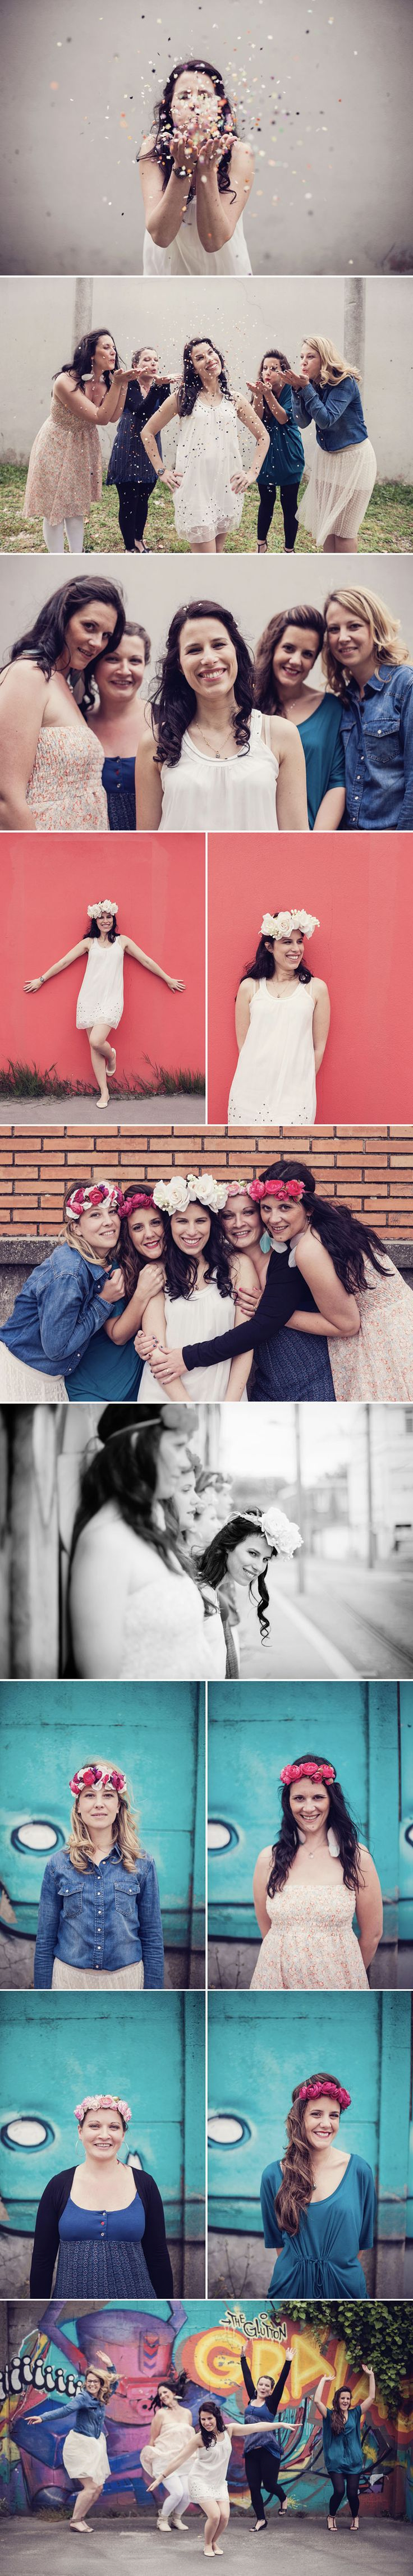 best wedding planneuse images on pinterest wedding ideas